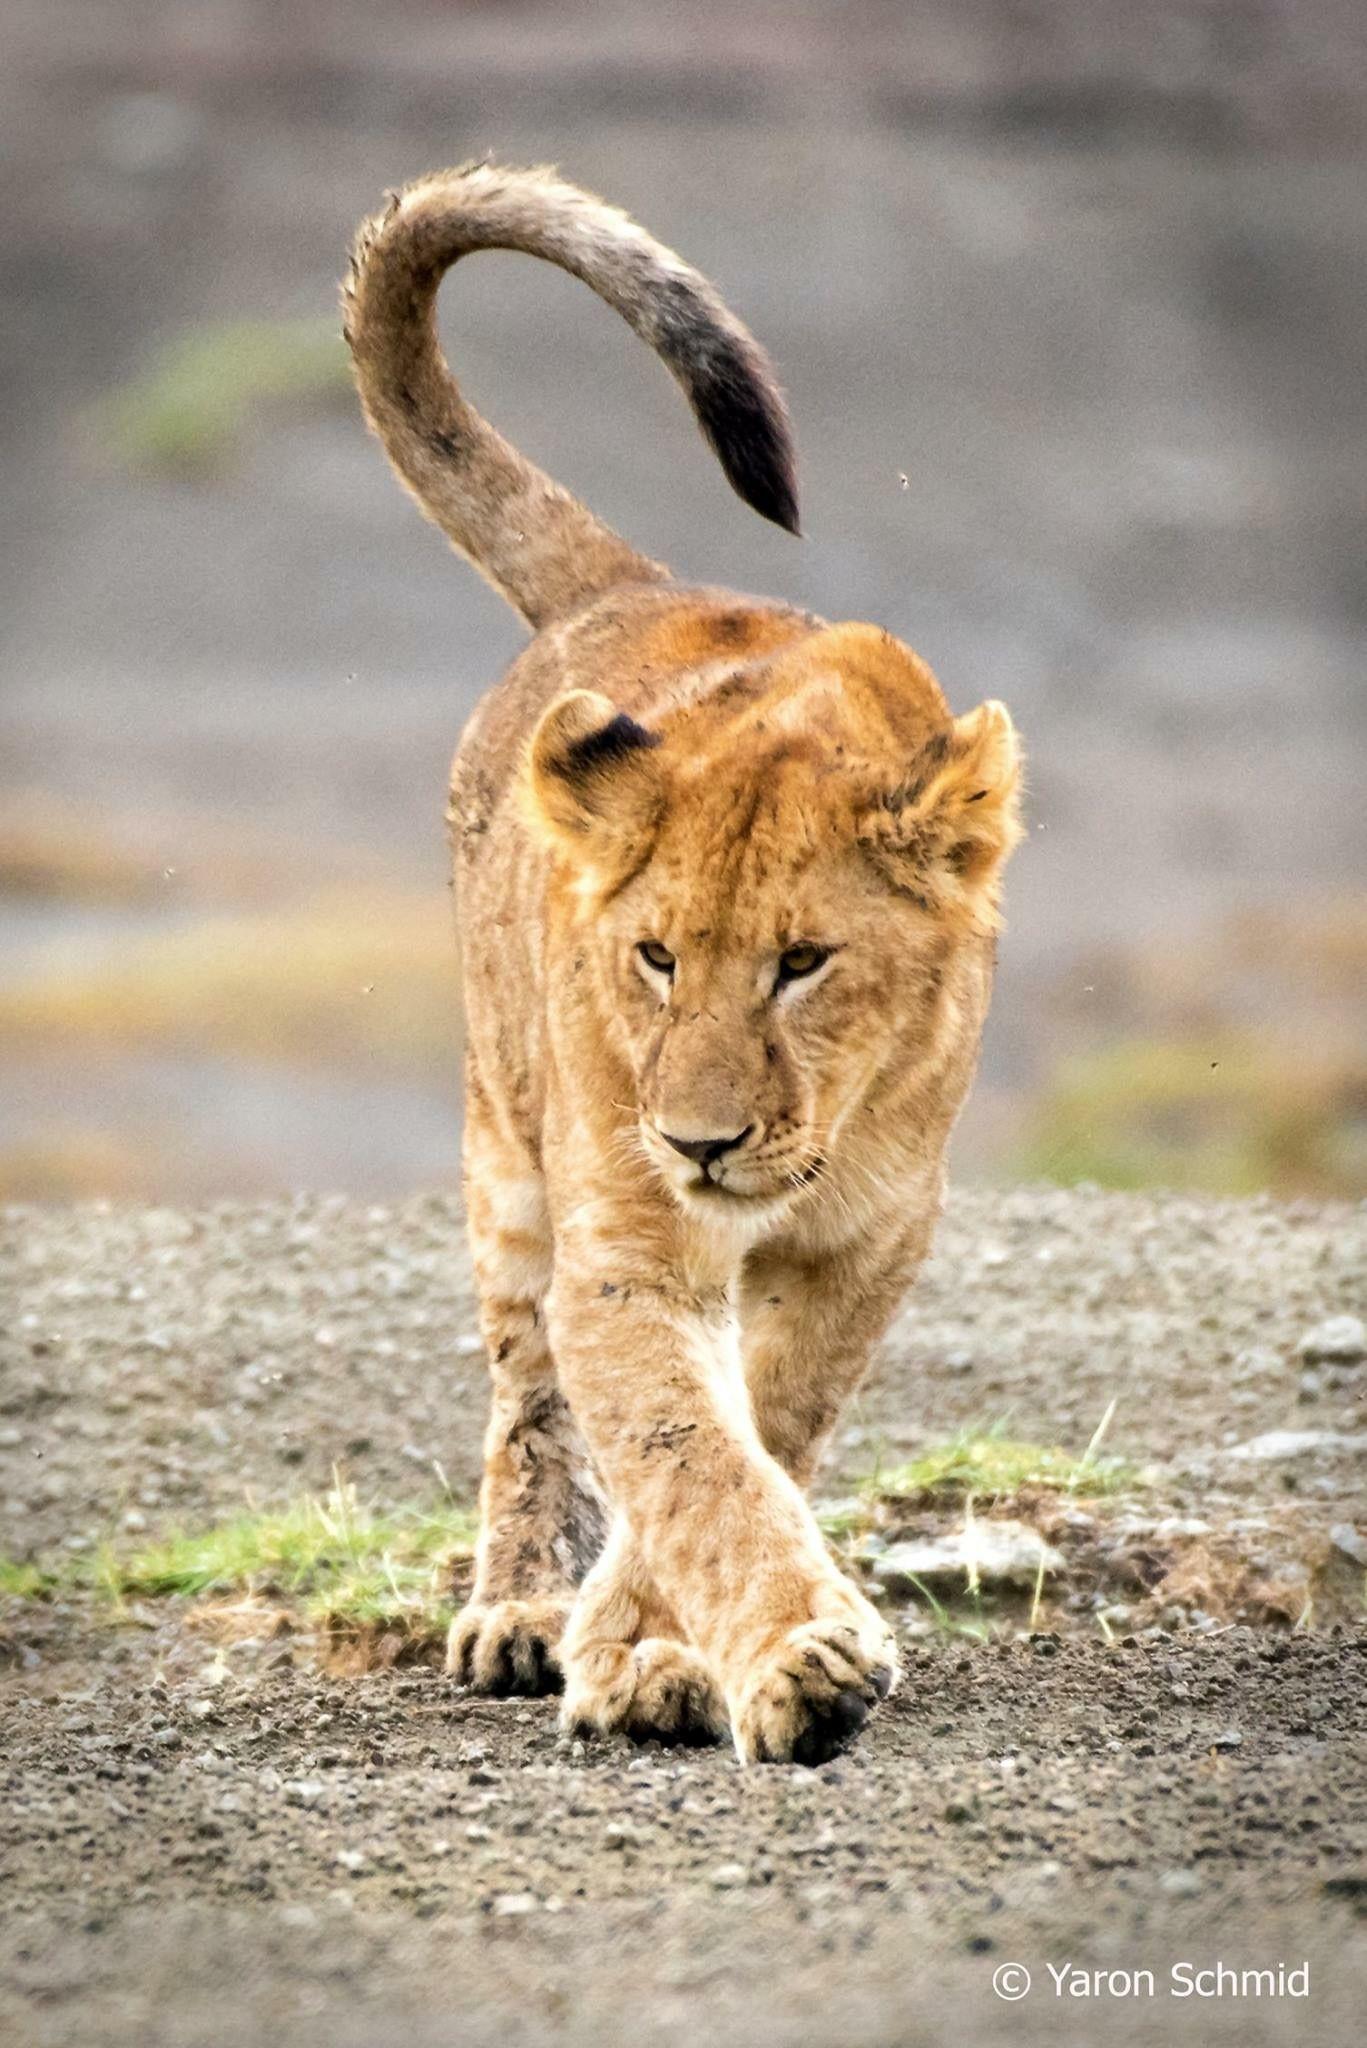 Pin de Donald Pope en Lions | Pinterest | Lobos y León